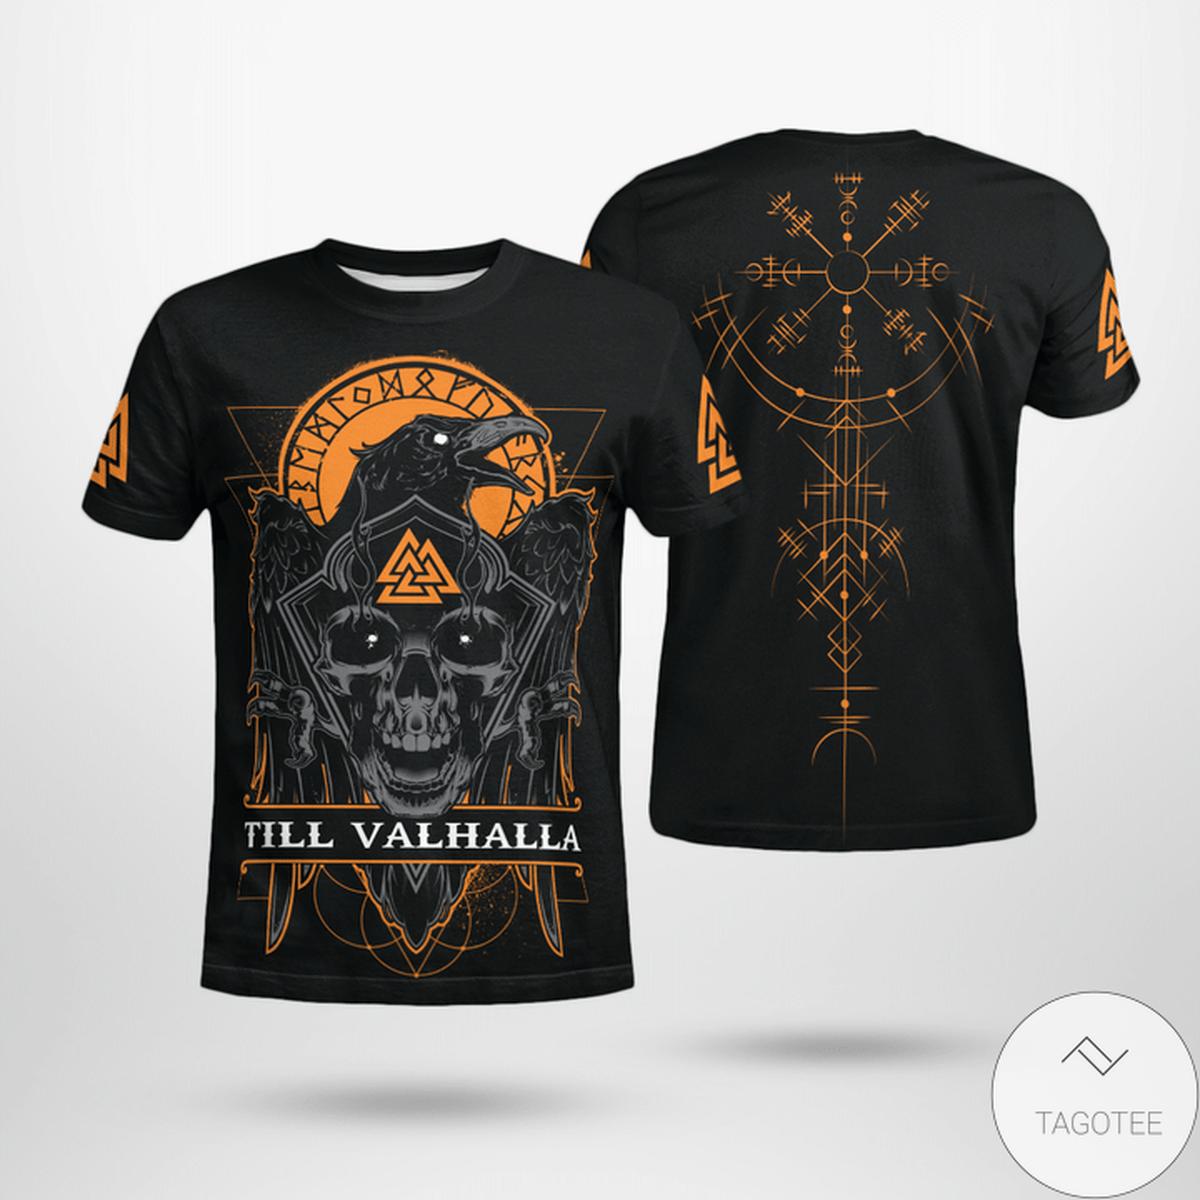 Raven - Til Valhalla Vegvisir Viking 3D T-shirt